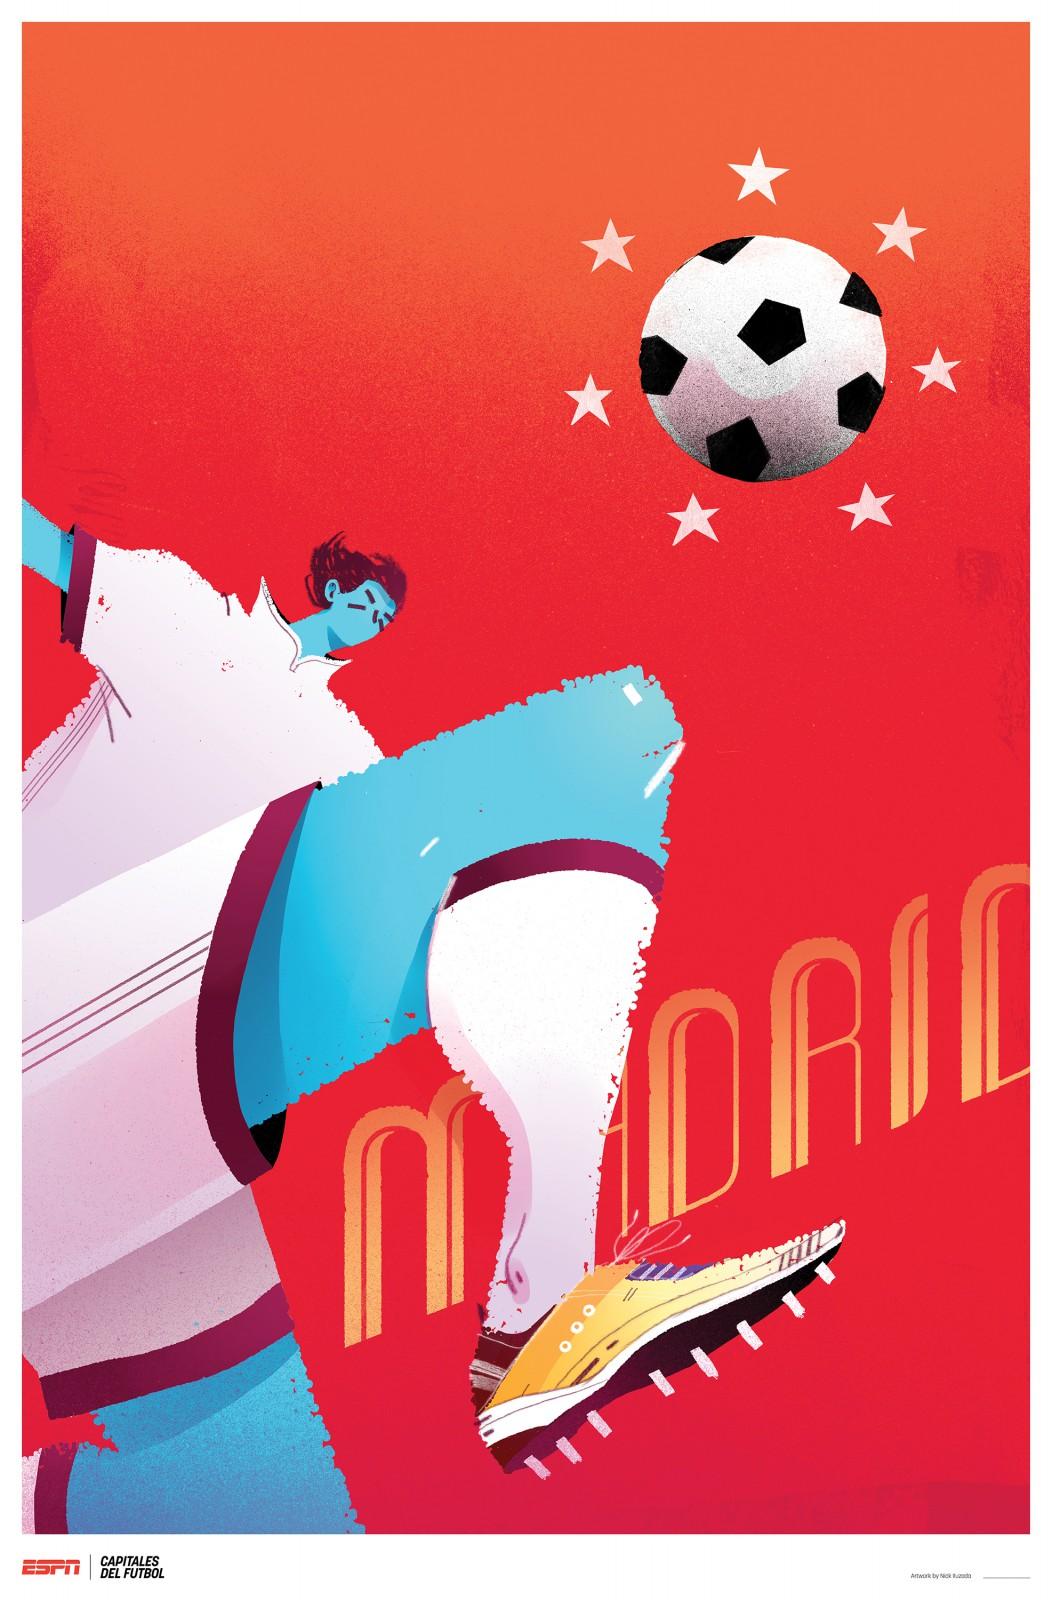 WeShouldDoItAll — ESPN Capitales del Fútbol